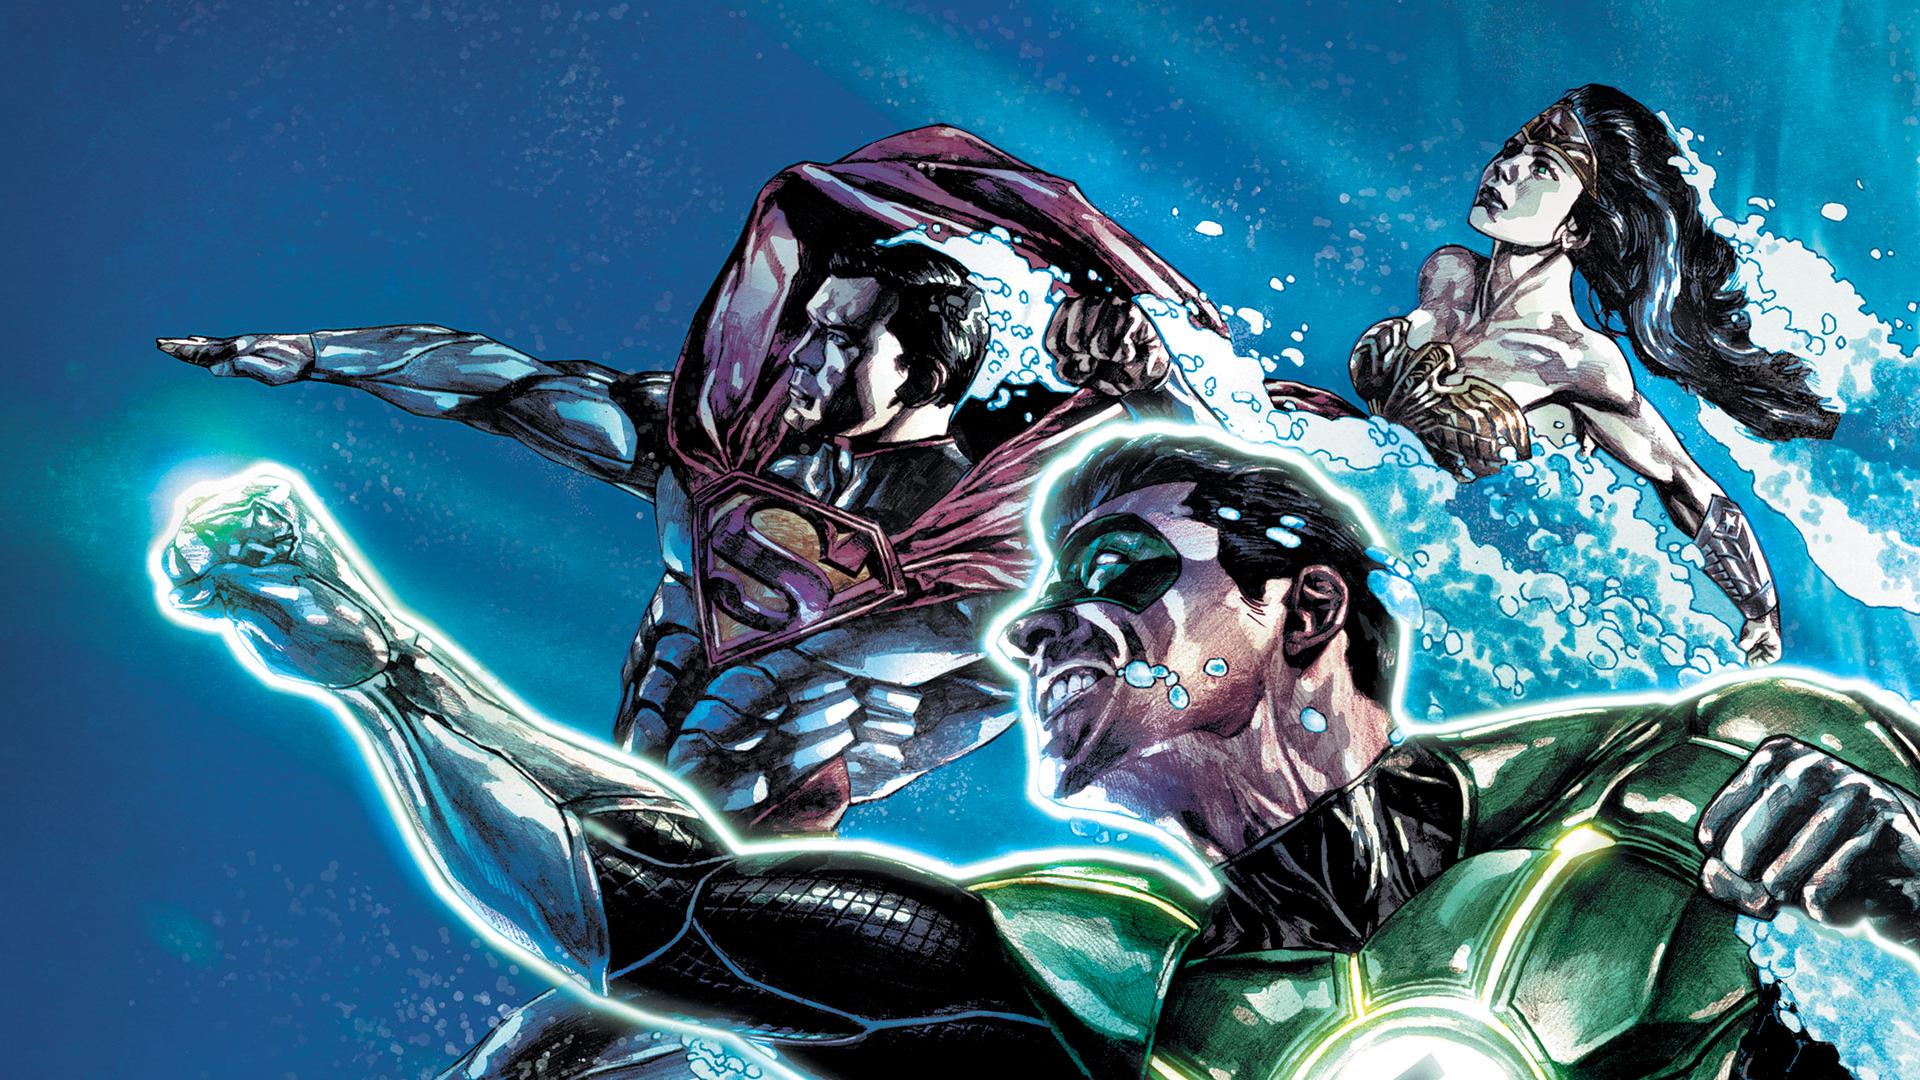 Alpha Coders | Wallpaper Abyss Comics Justice League Of America 400066